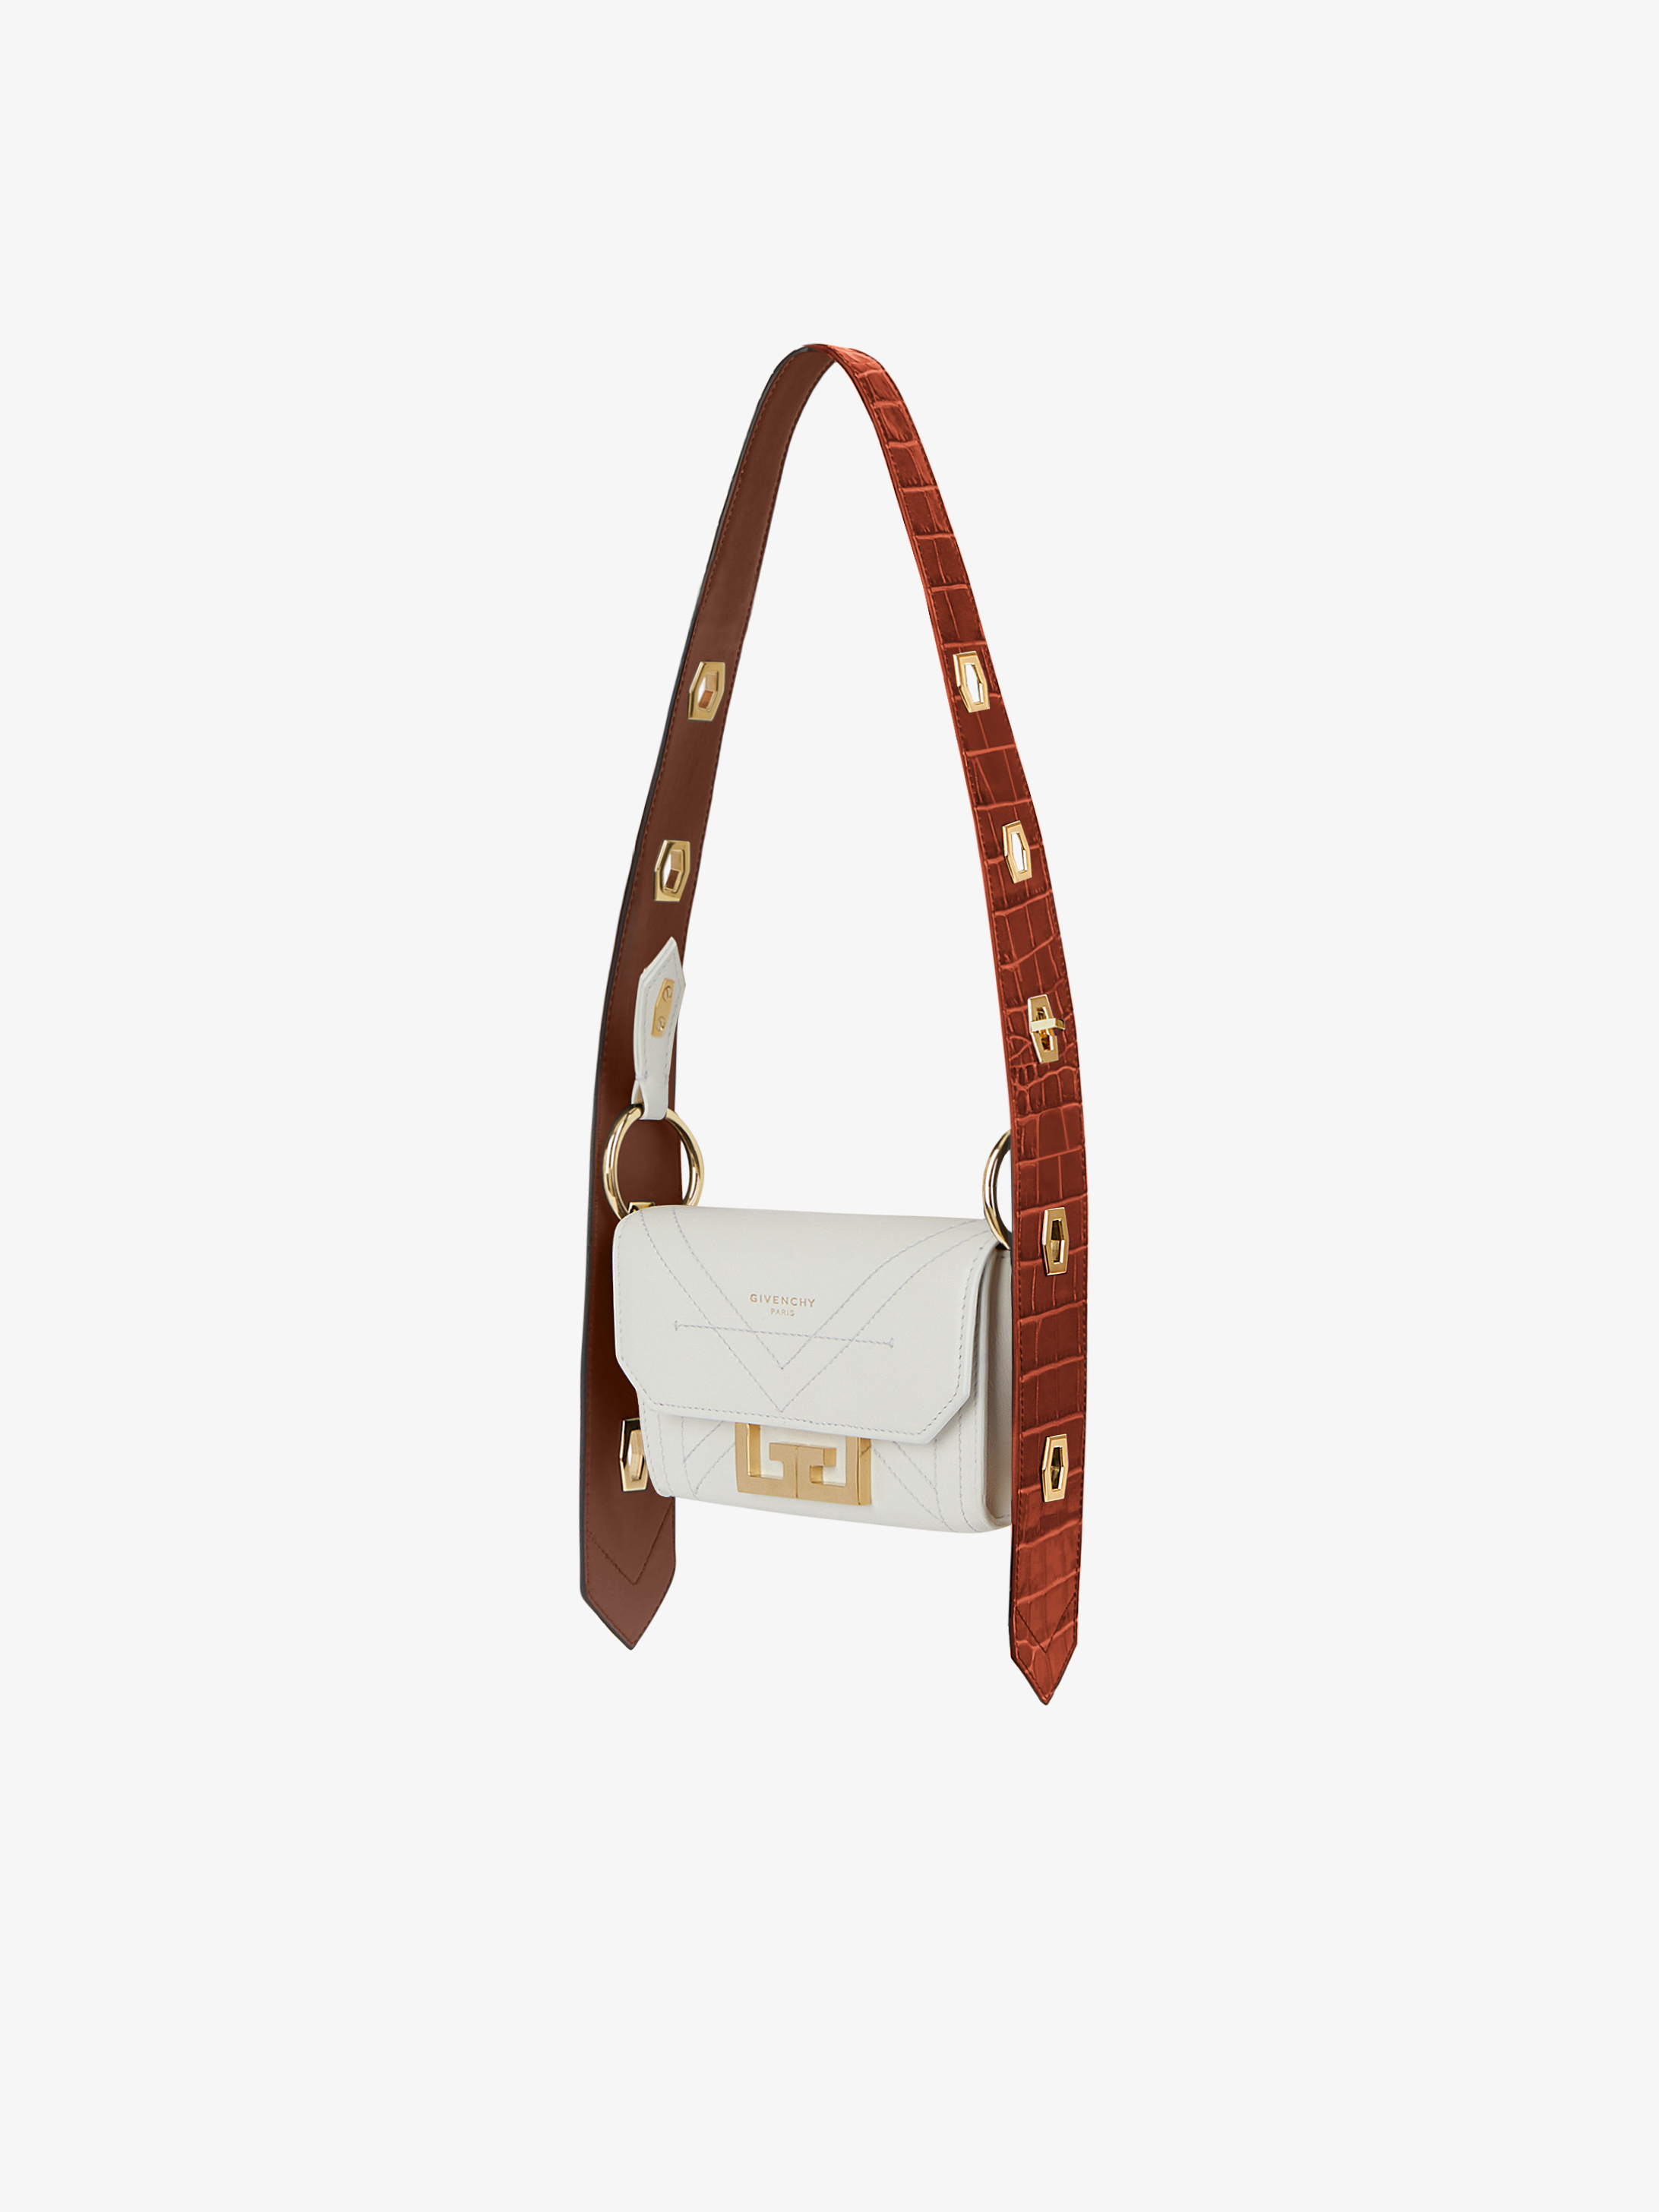 Nano two-tone Eden bag in leather